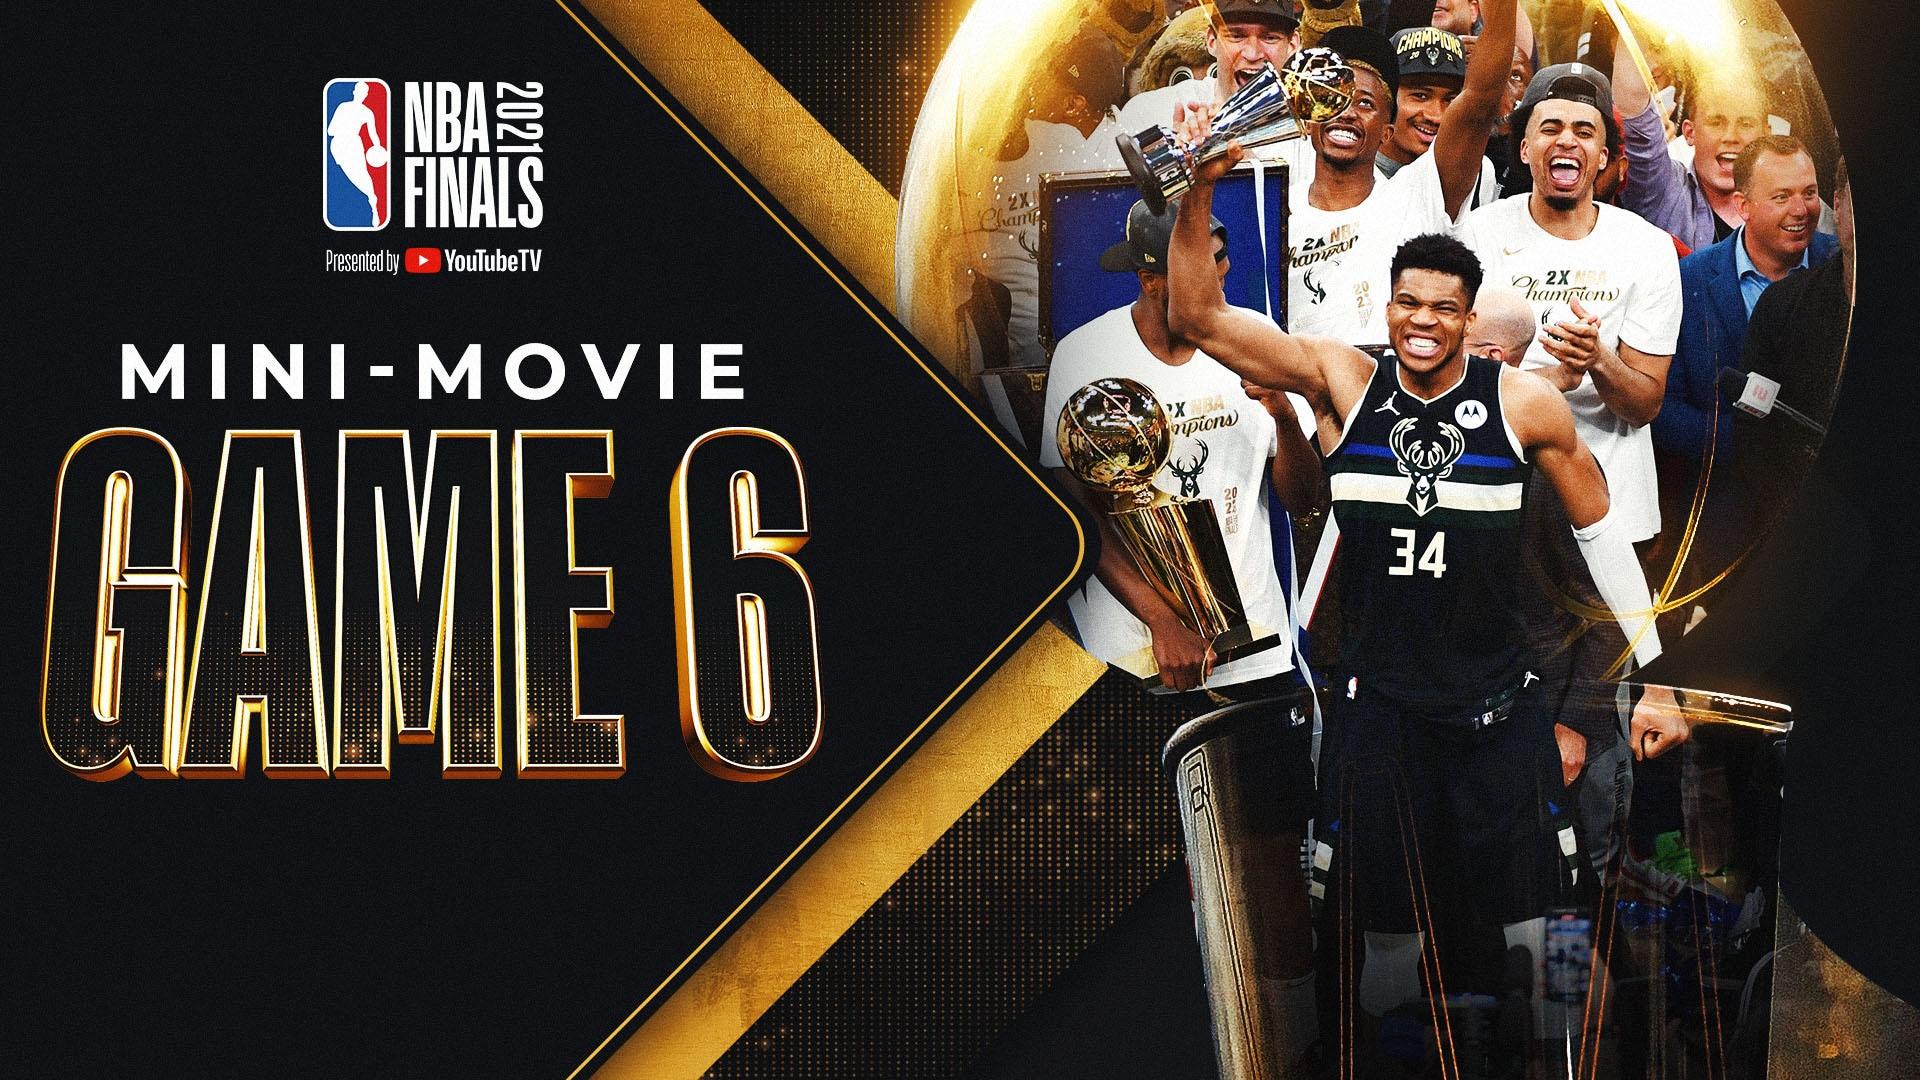 2021 NBA Finals Mini-Movie: Game 6